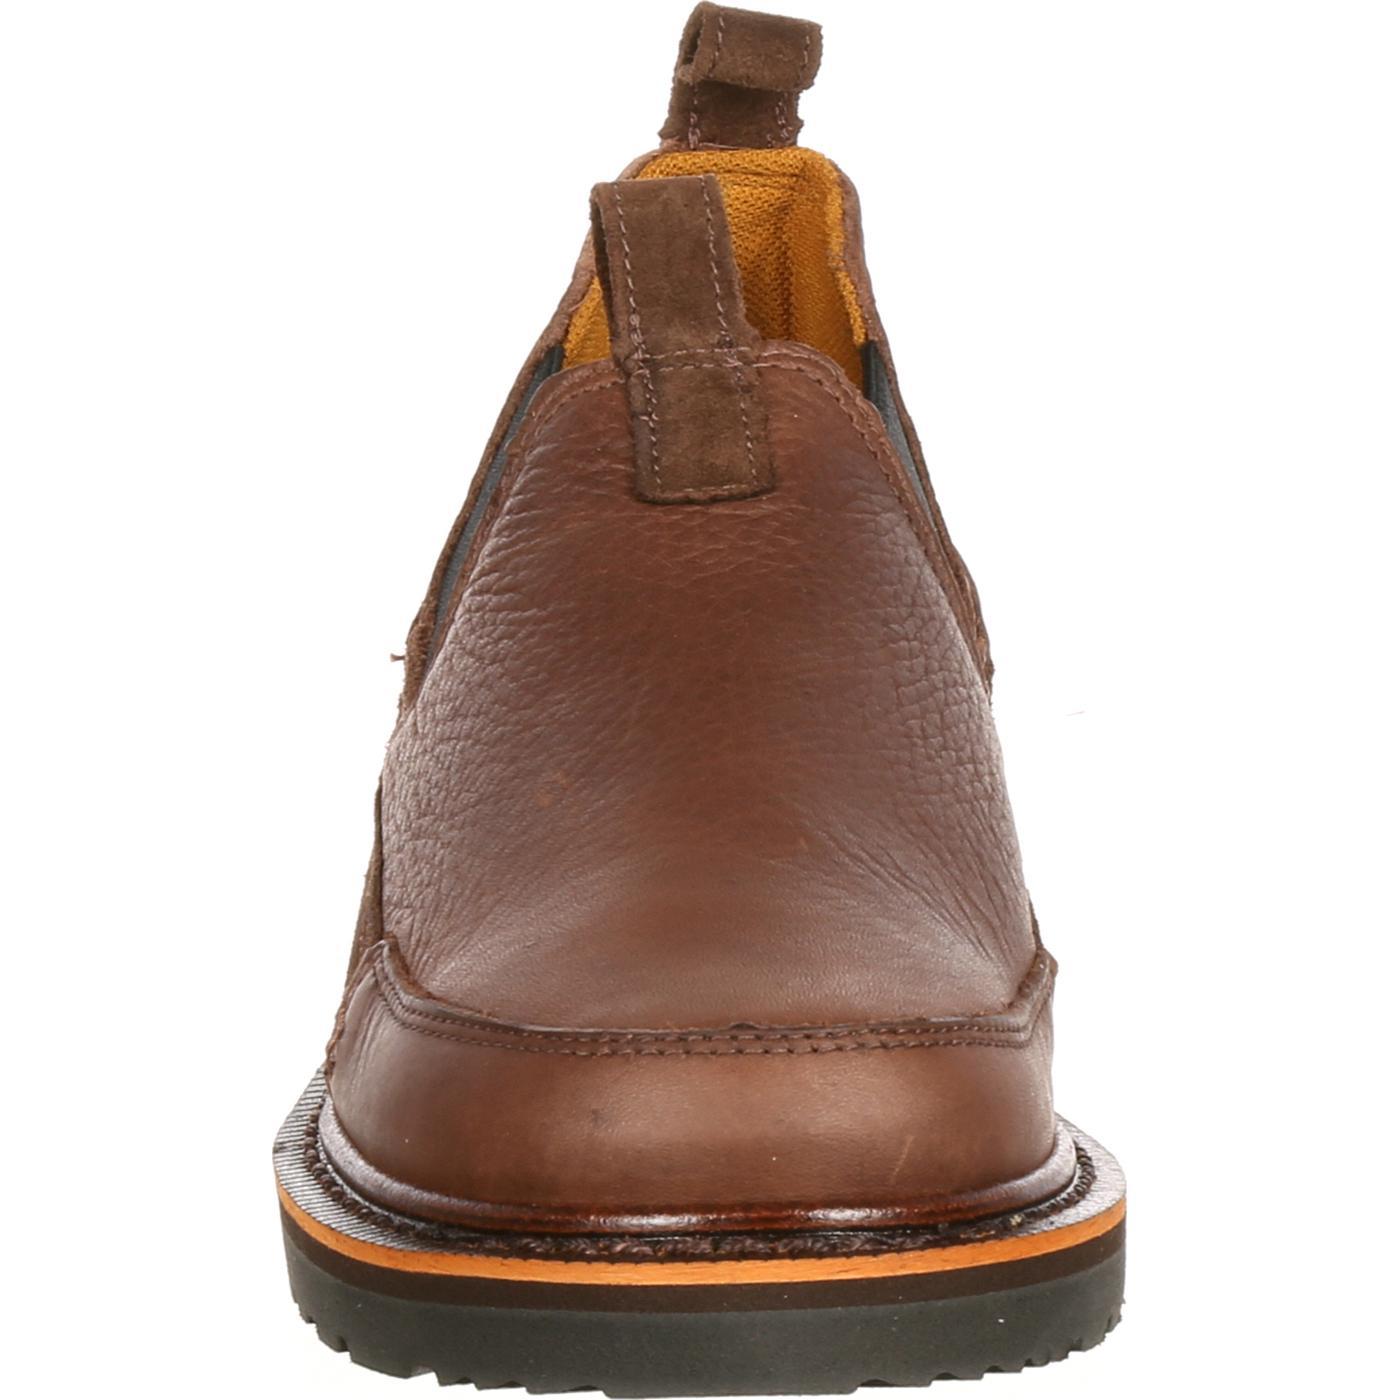 0f72d9be1c7 Georgia Giant Romeo Slip-On Work Shoe